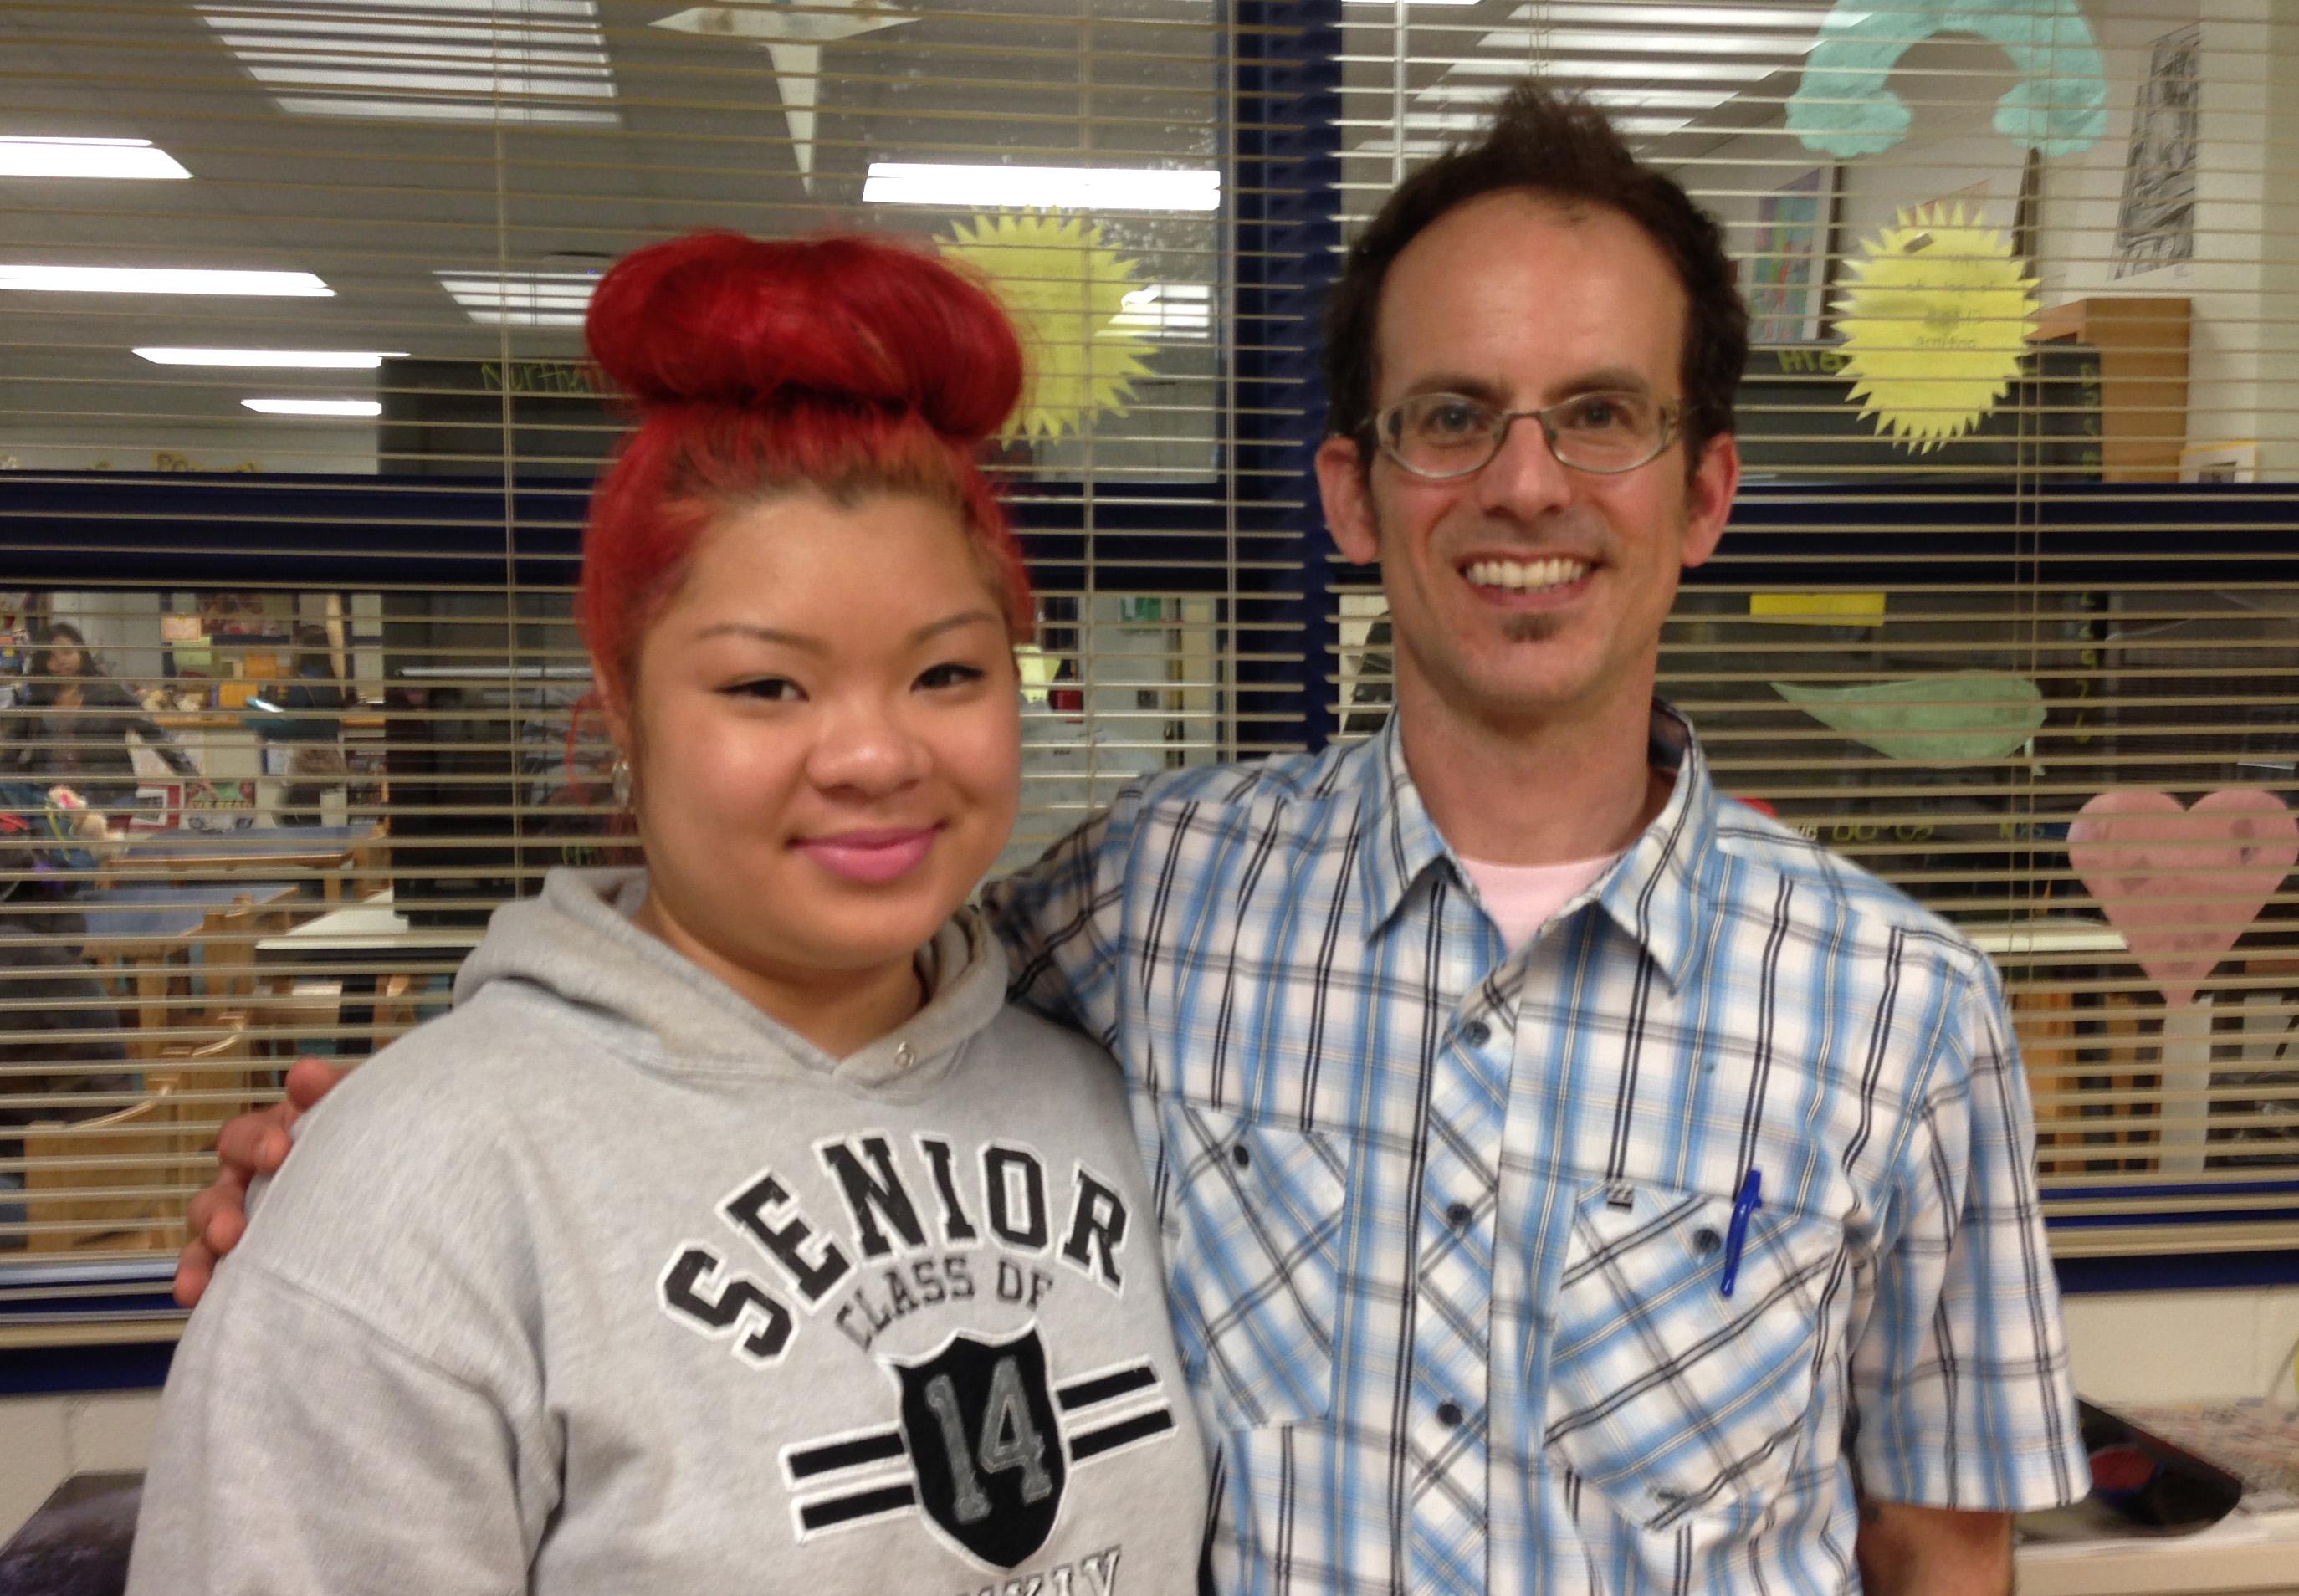 Caption: Northern High School senior Katie Tran and track coach/math teacher Blake Rahn, Credit: Will Michaels